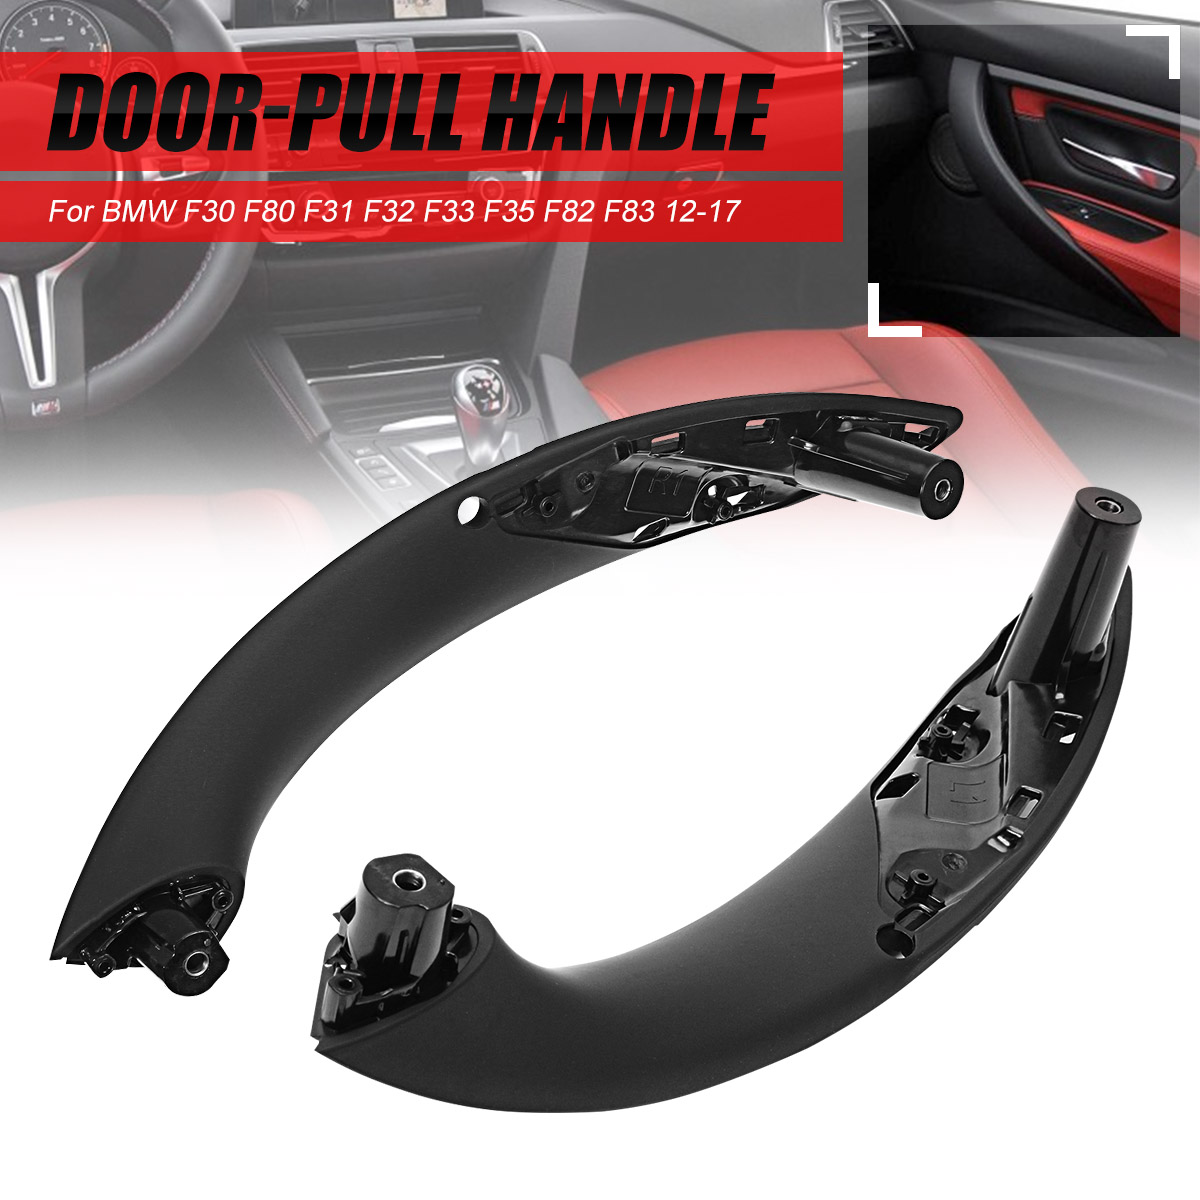 Cubierta de la manija de la puerta 4 piezas de la manija del tirador de la puerta interior del coche 51417279311 Ajuste para F30 F32 F34 F82 izquierda